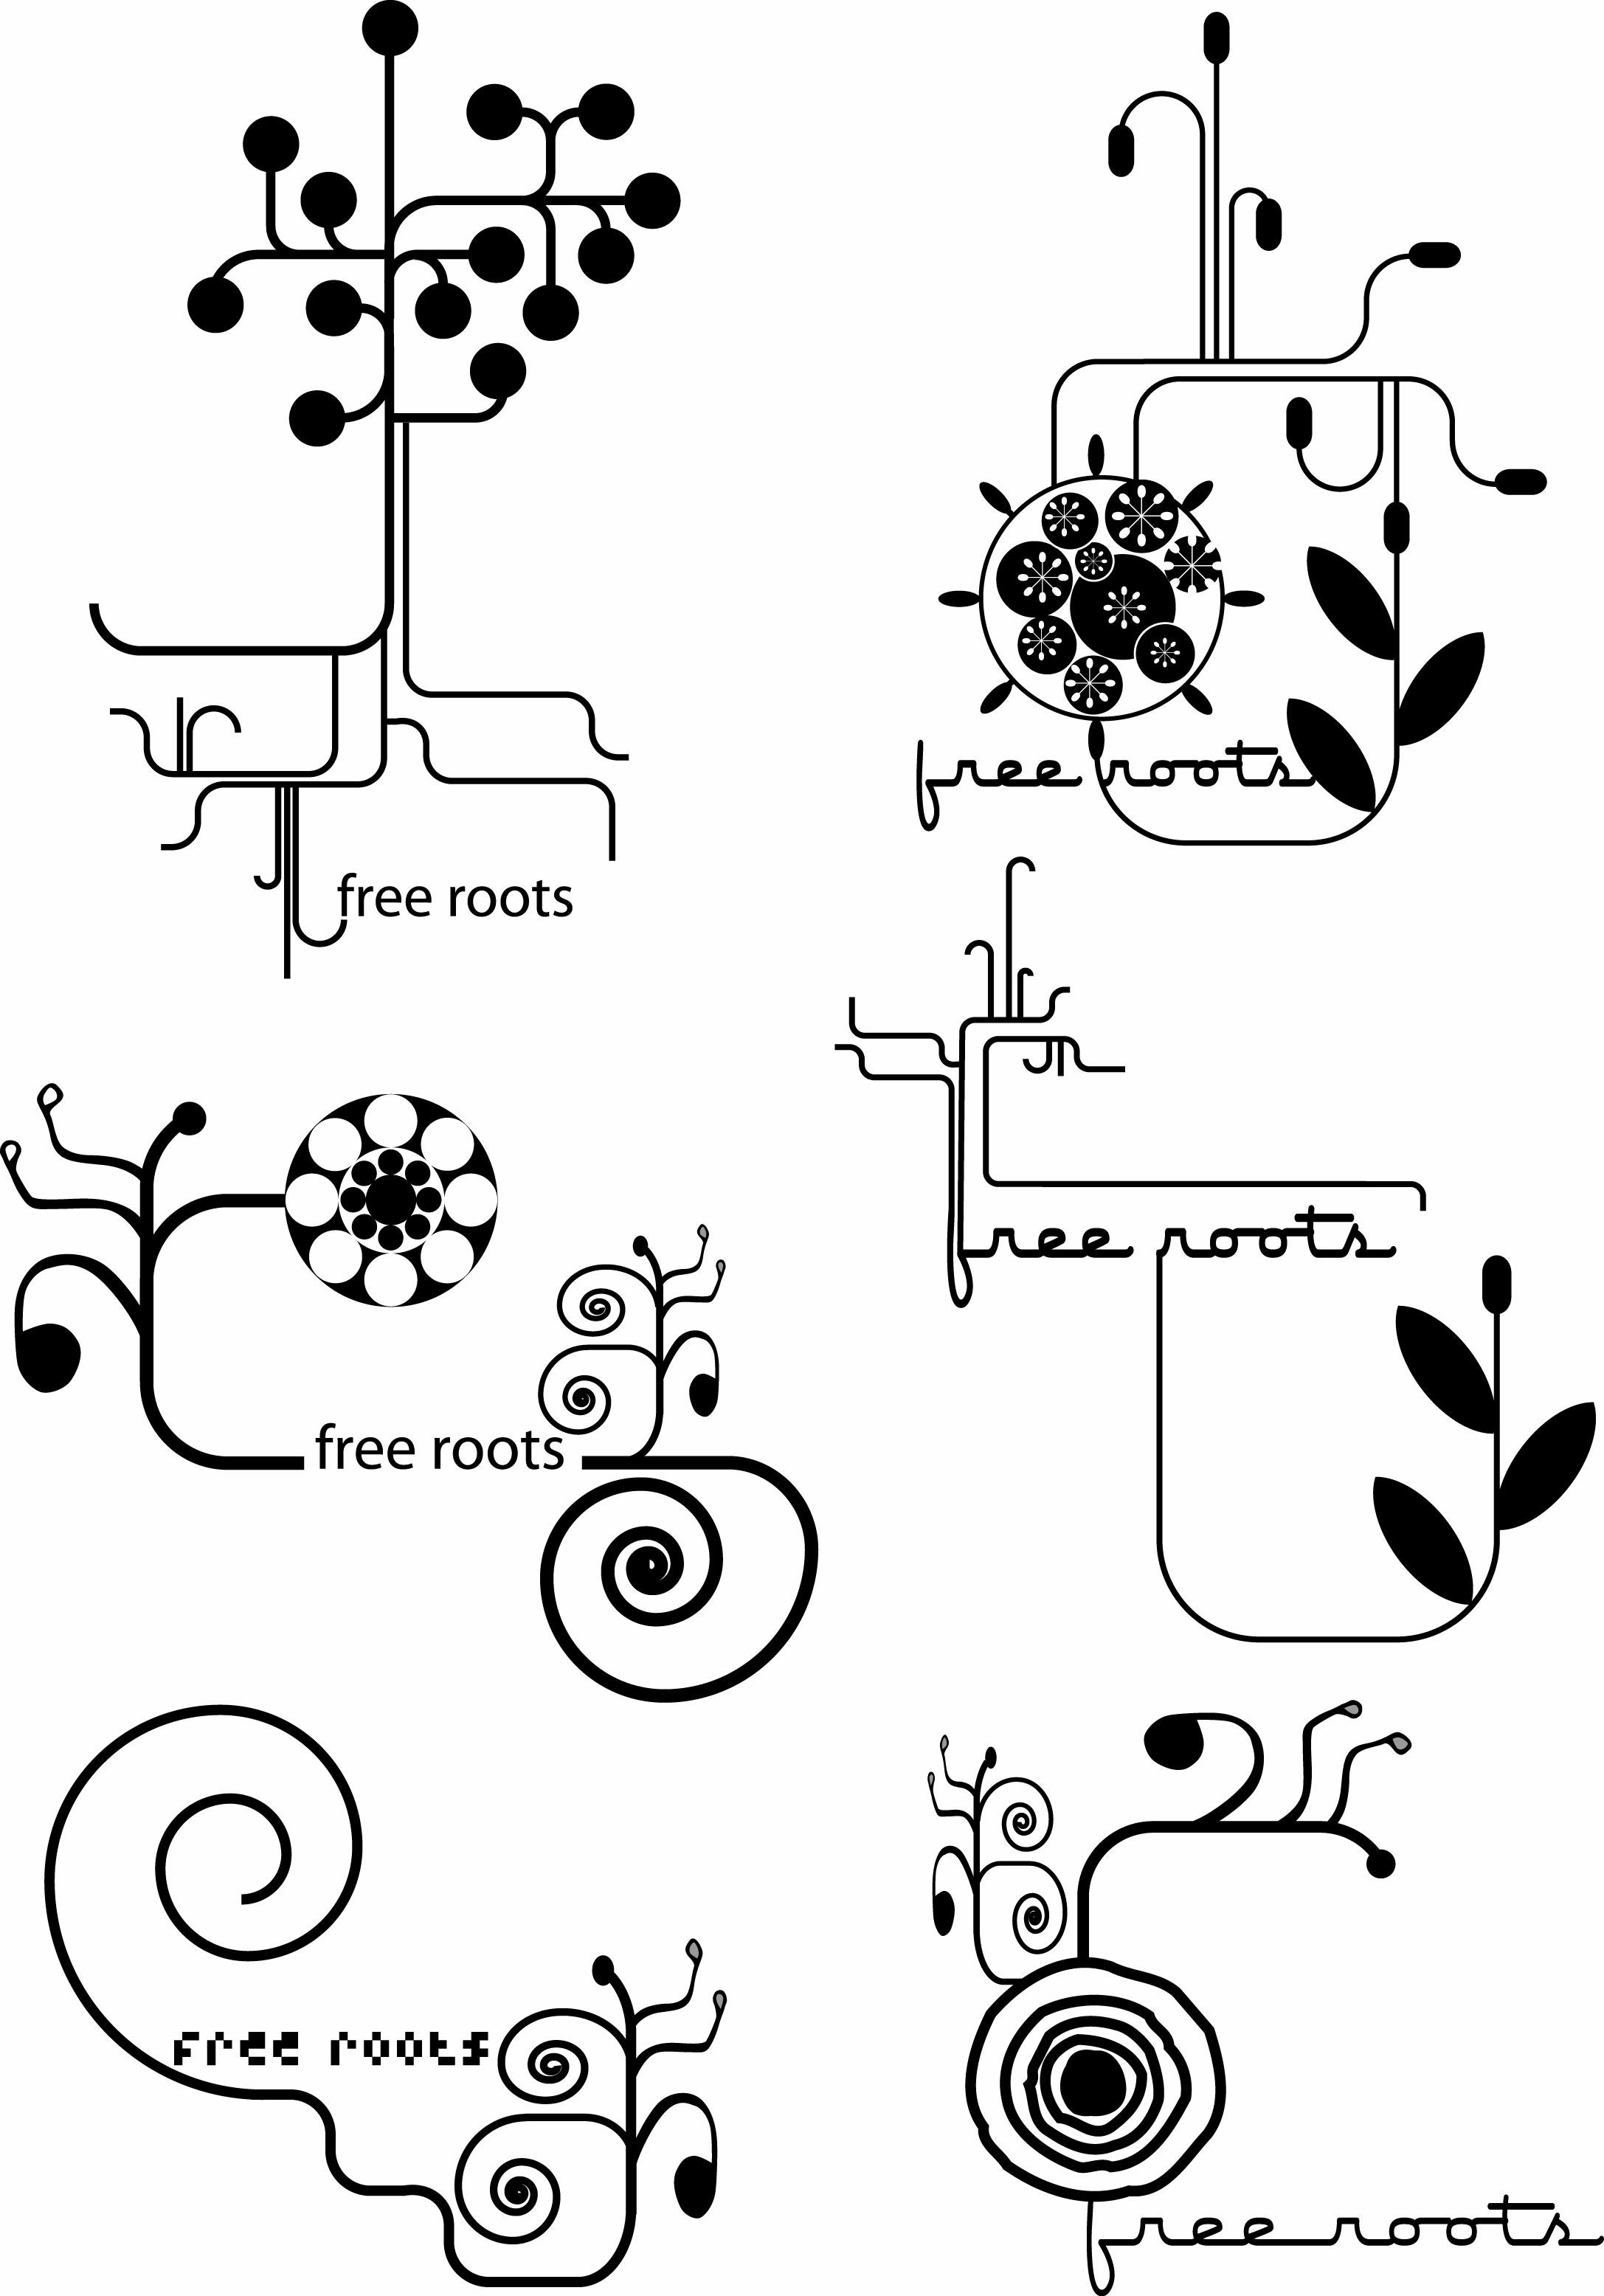 ▲ Free roots logo ▲